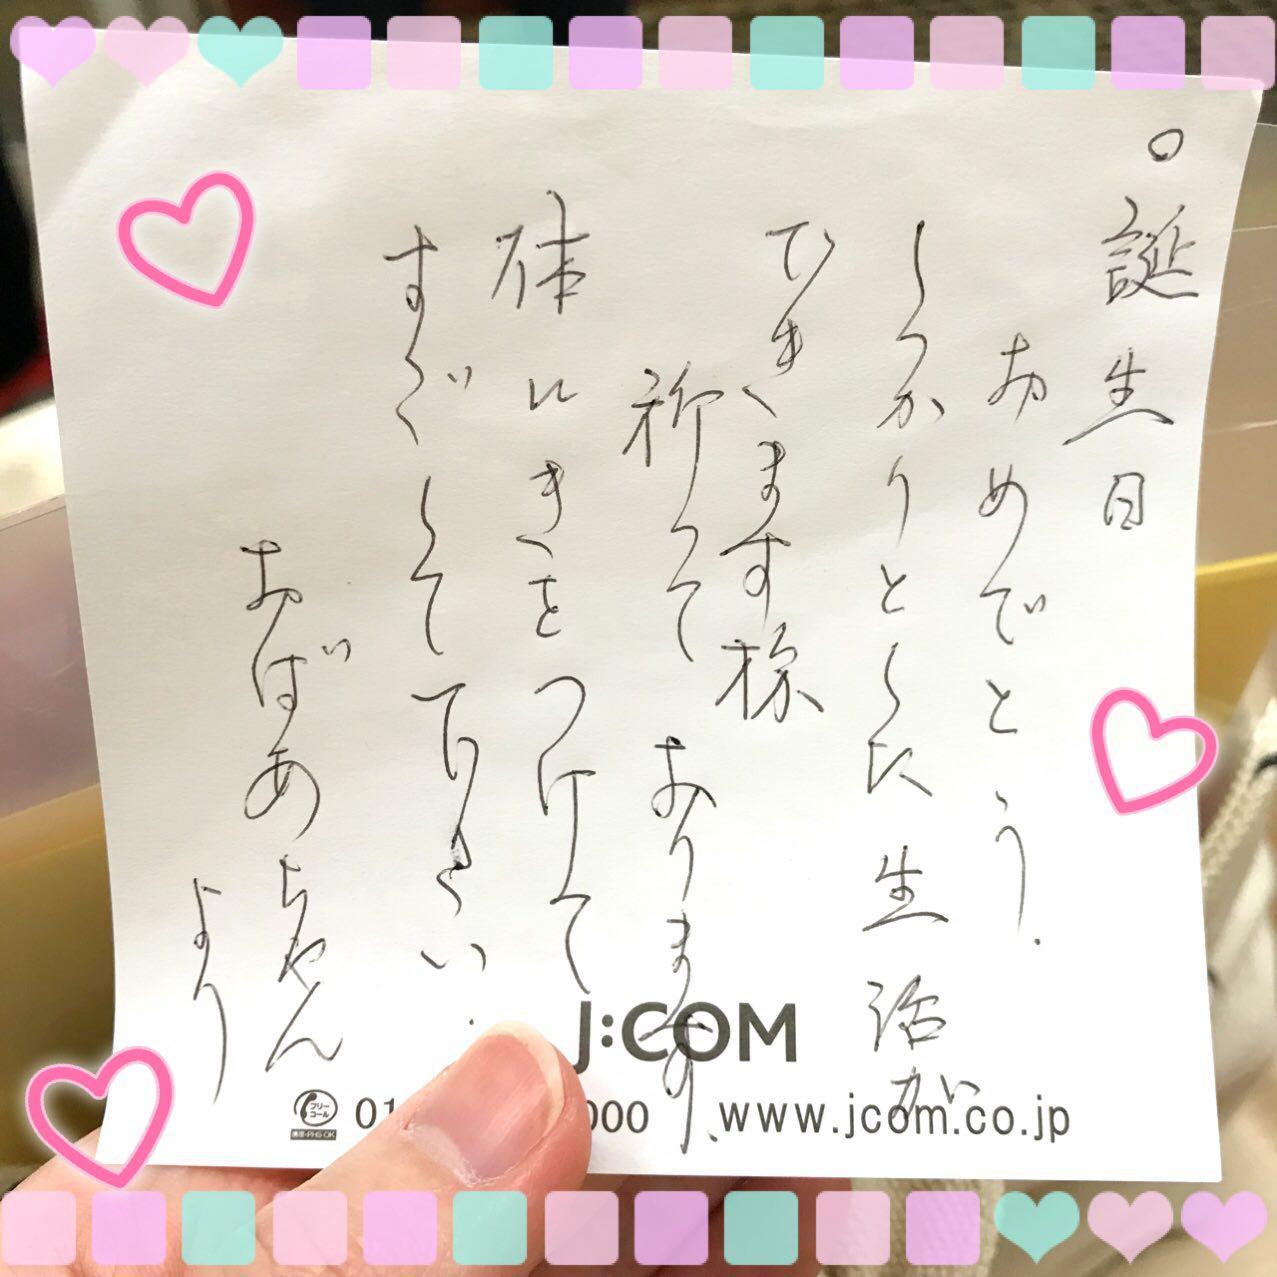 photo_2018-03-19_23-18-16.jpg